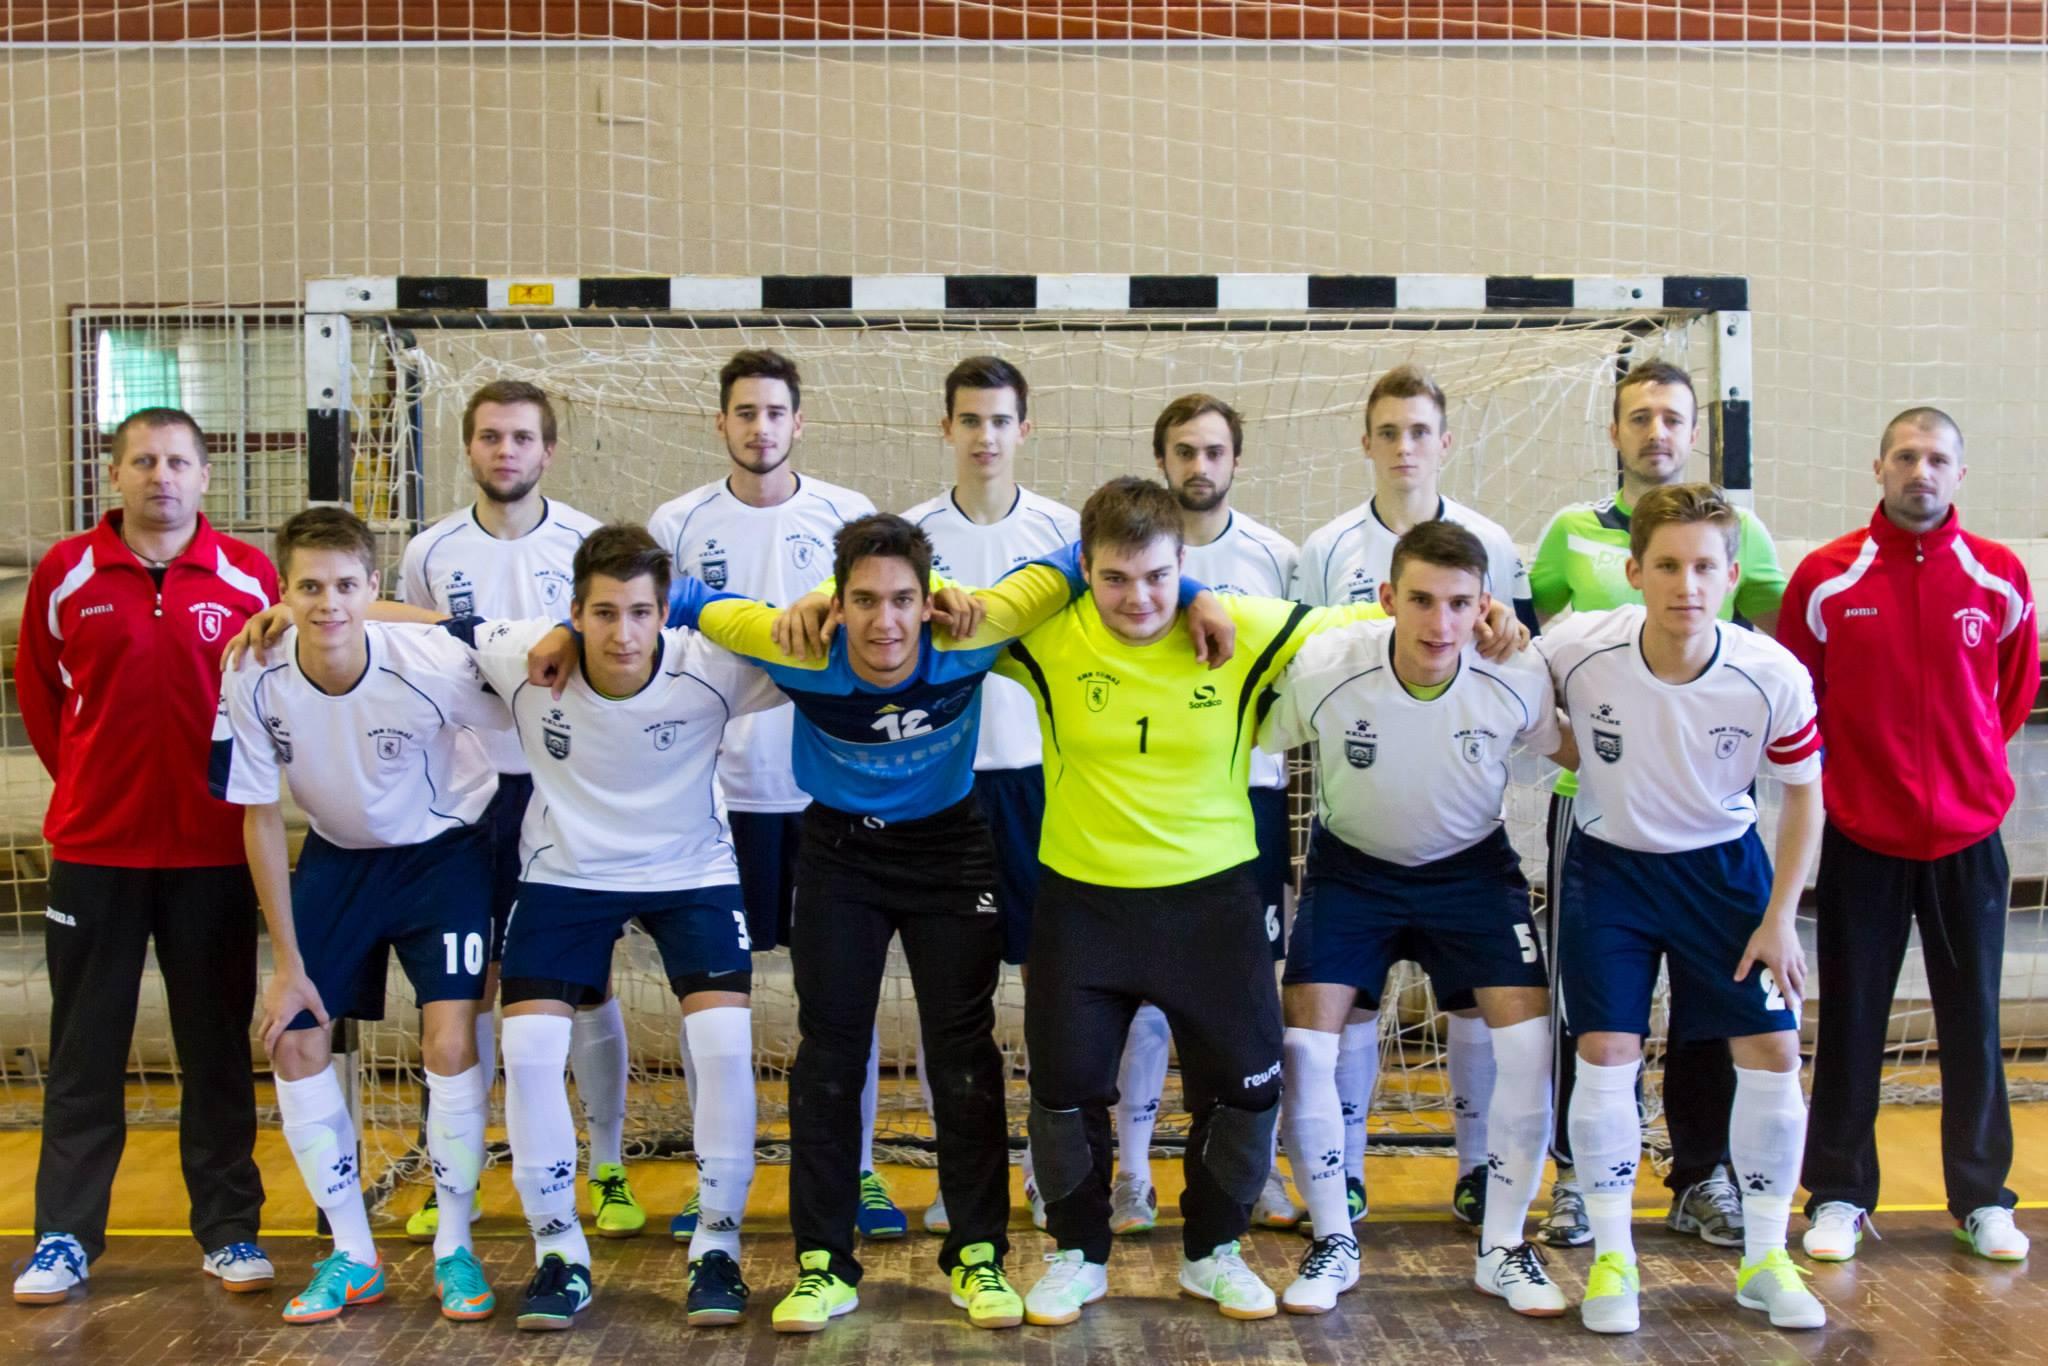 FUTSAL, ZLMN Ormož: Razpored tekem 3. kroga; Visoka zmaga Petelinov U21